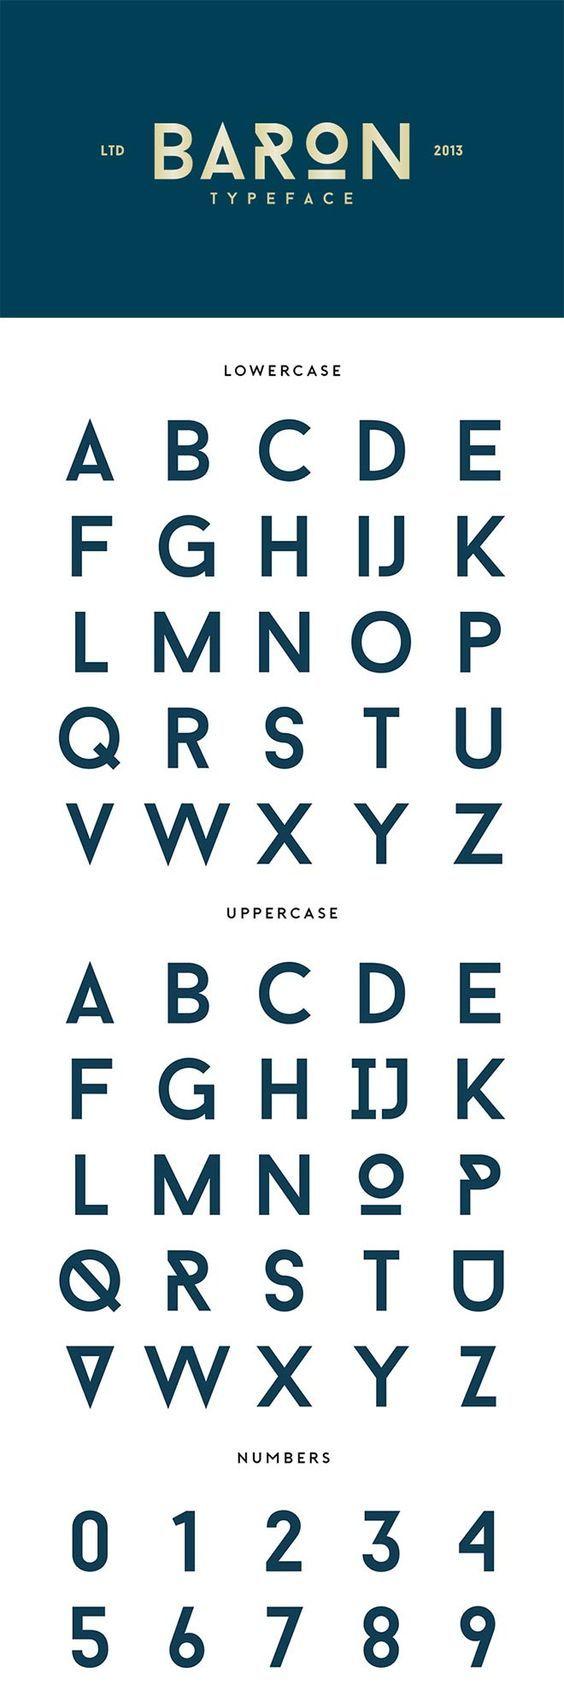 68 best Industrial & Technical Fonts images on Pinterest | Fonts ...